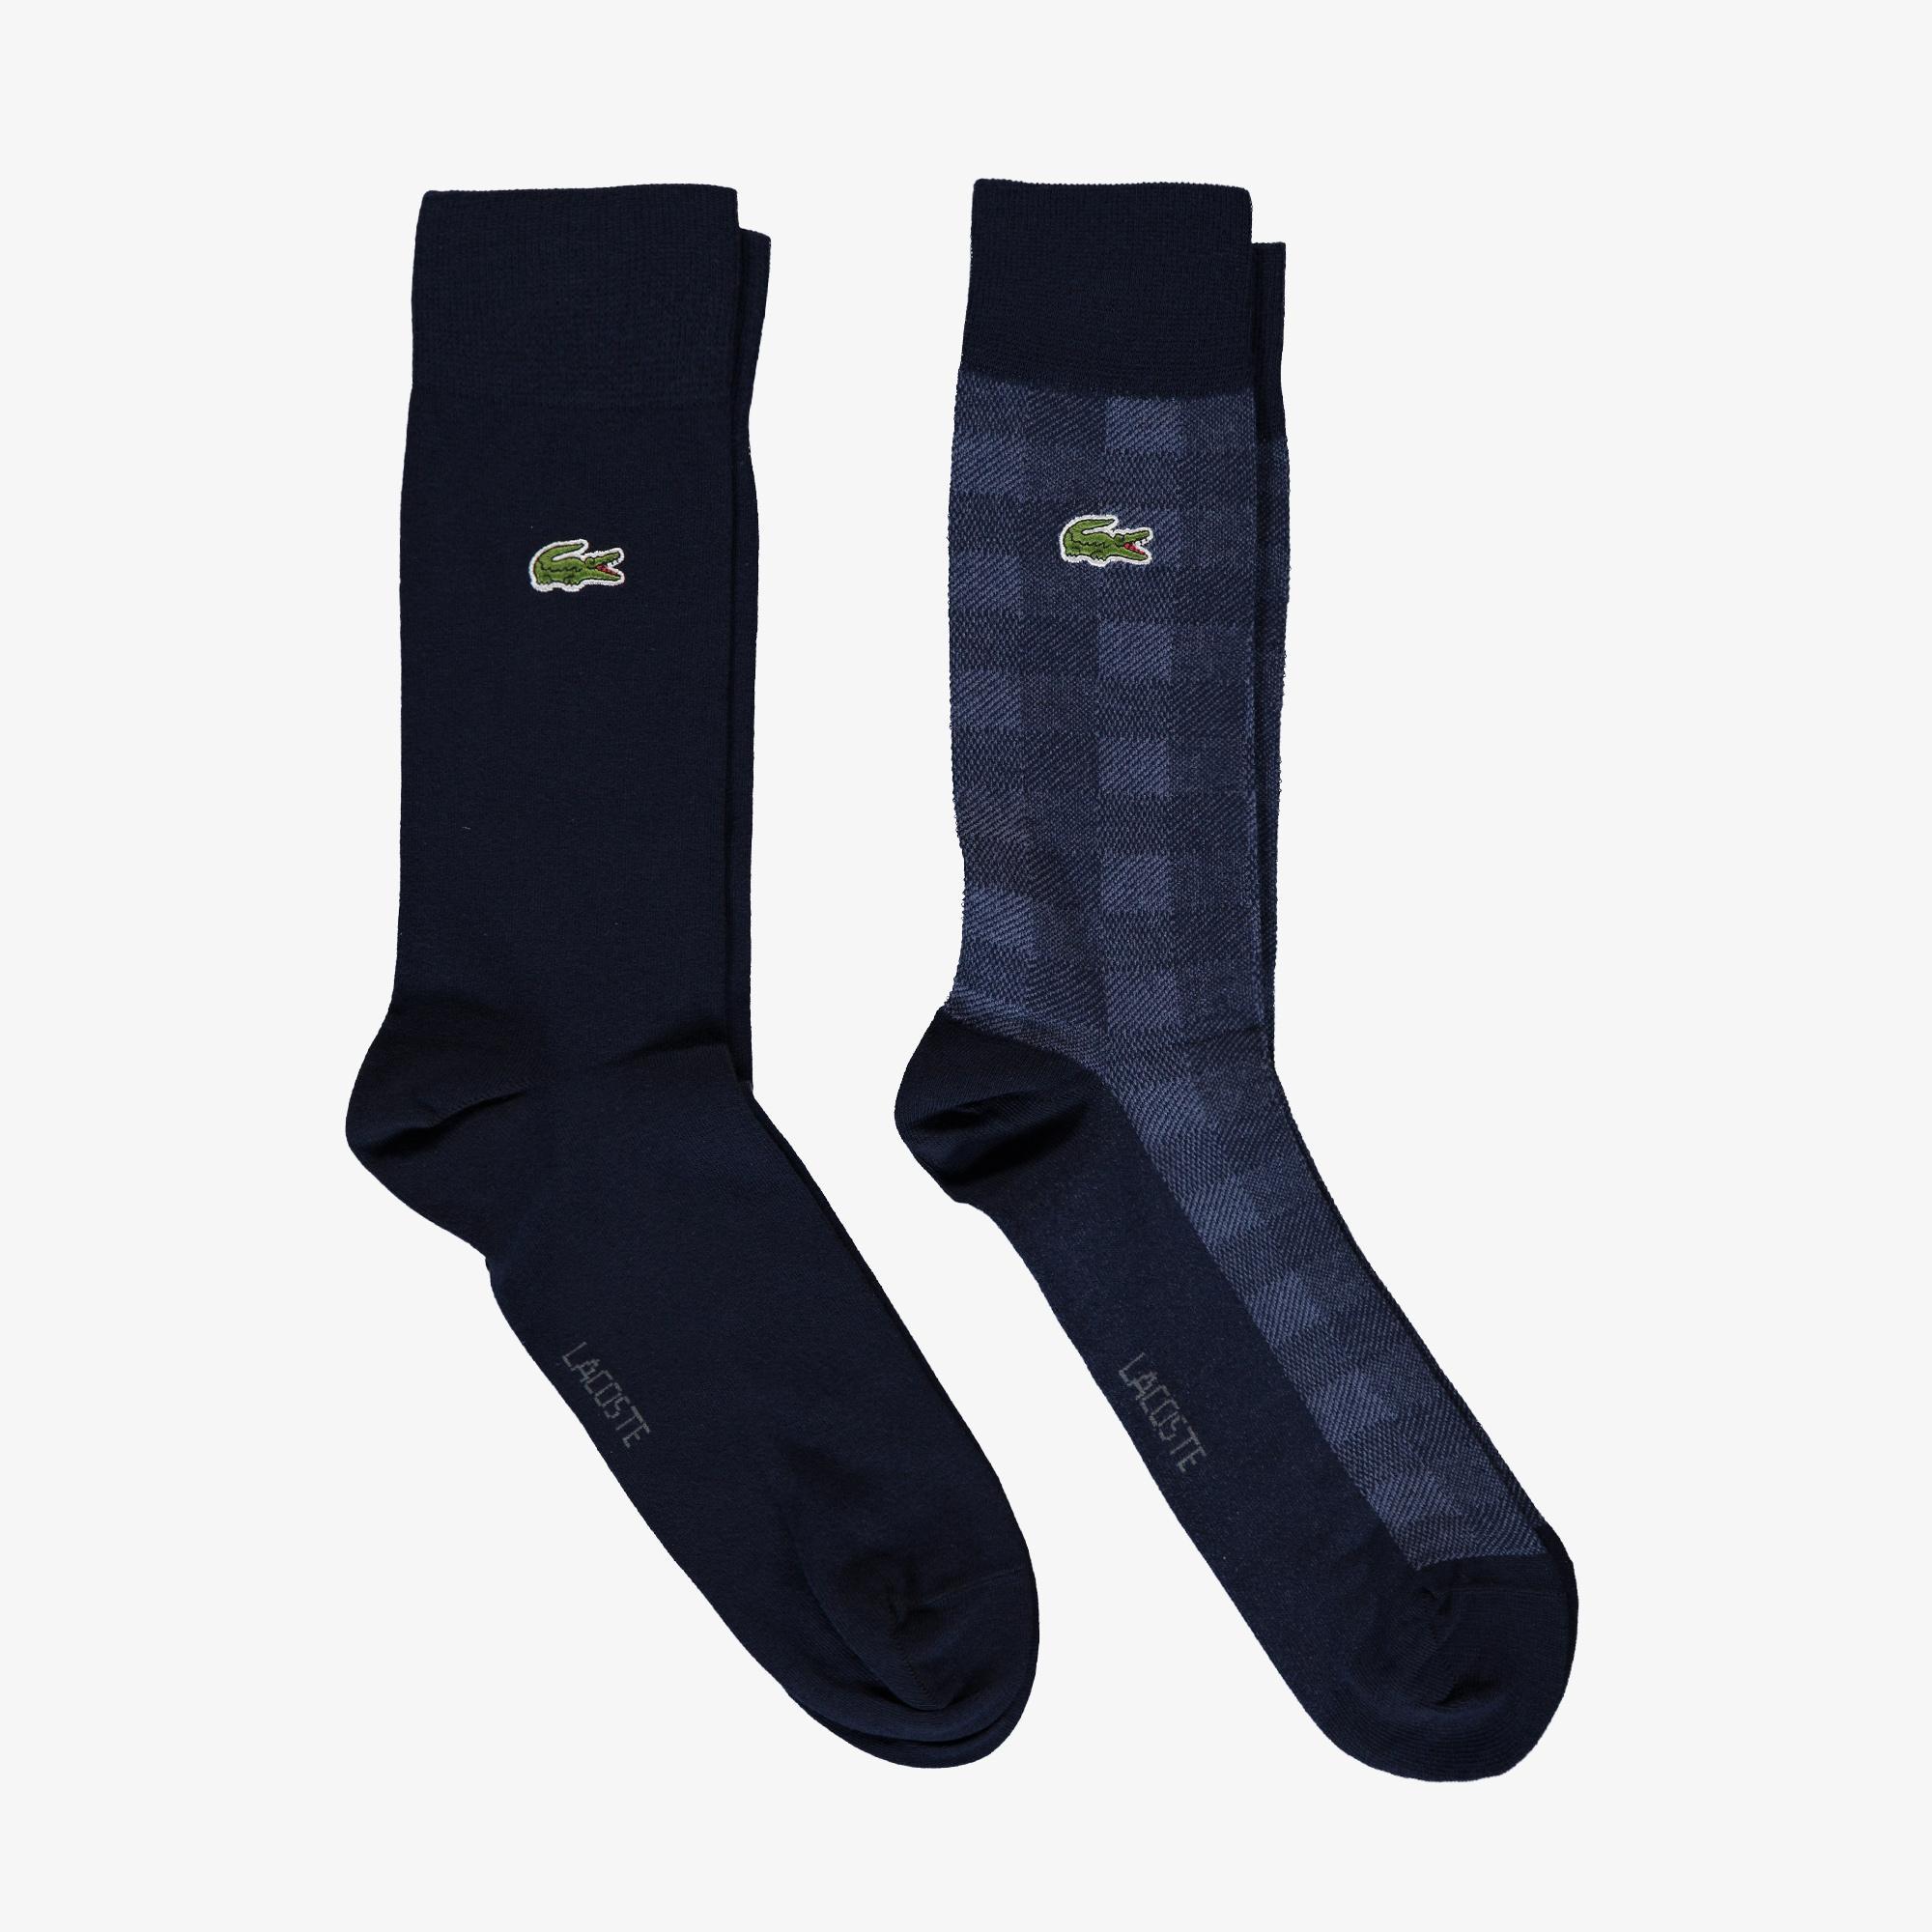 Lacoste шкарпетки унісекс 2 шт.